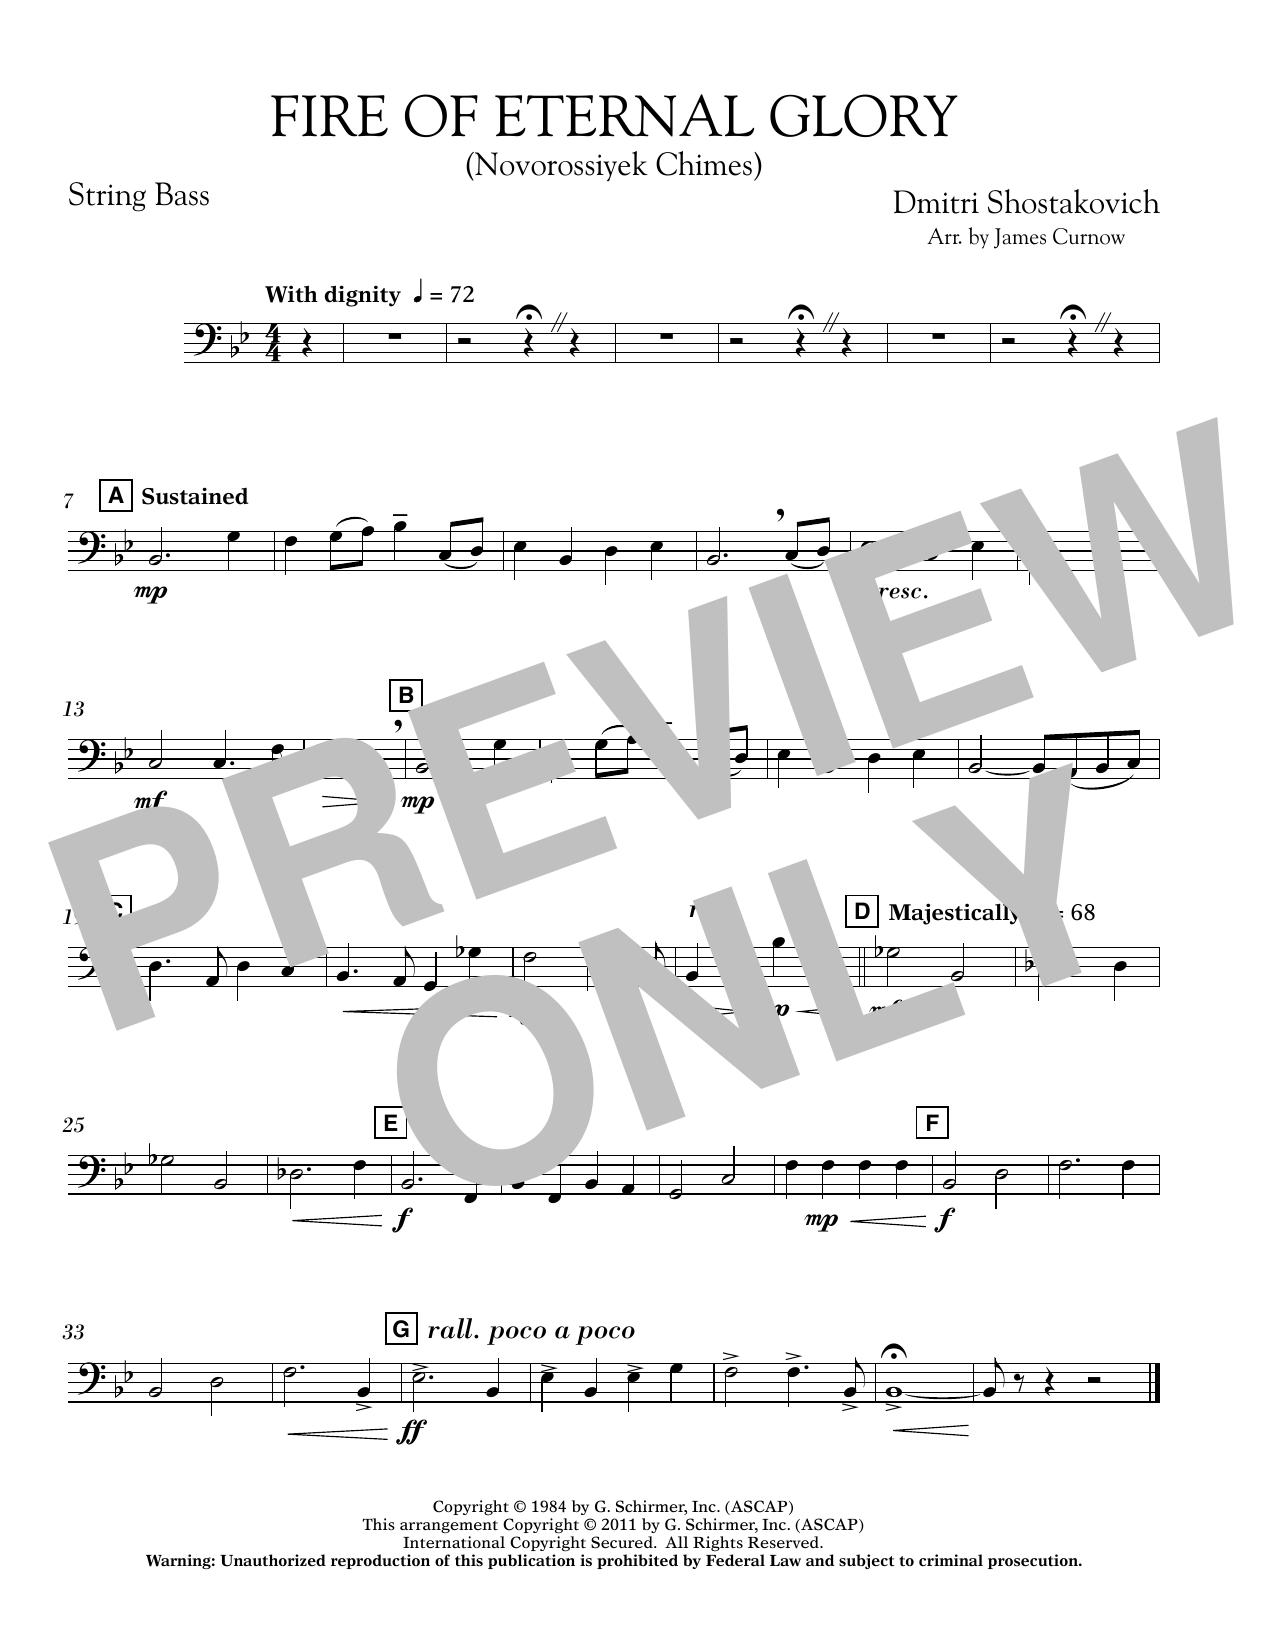 Fire of Eternal Glory (Novorossiyek Chimes) - String Bass (Concert Band)